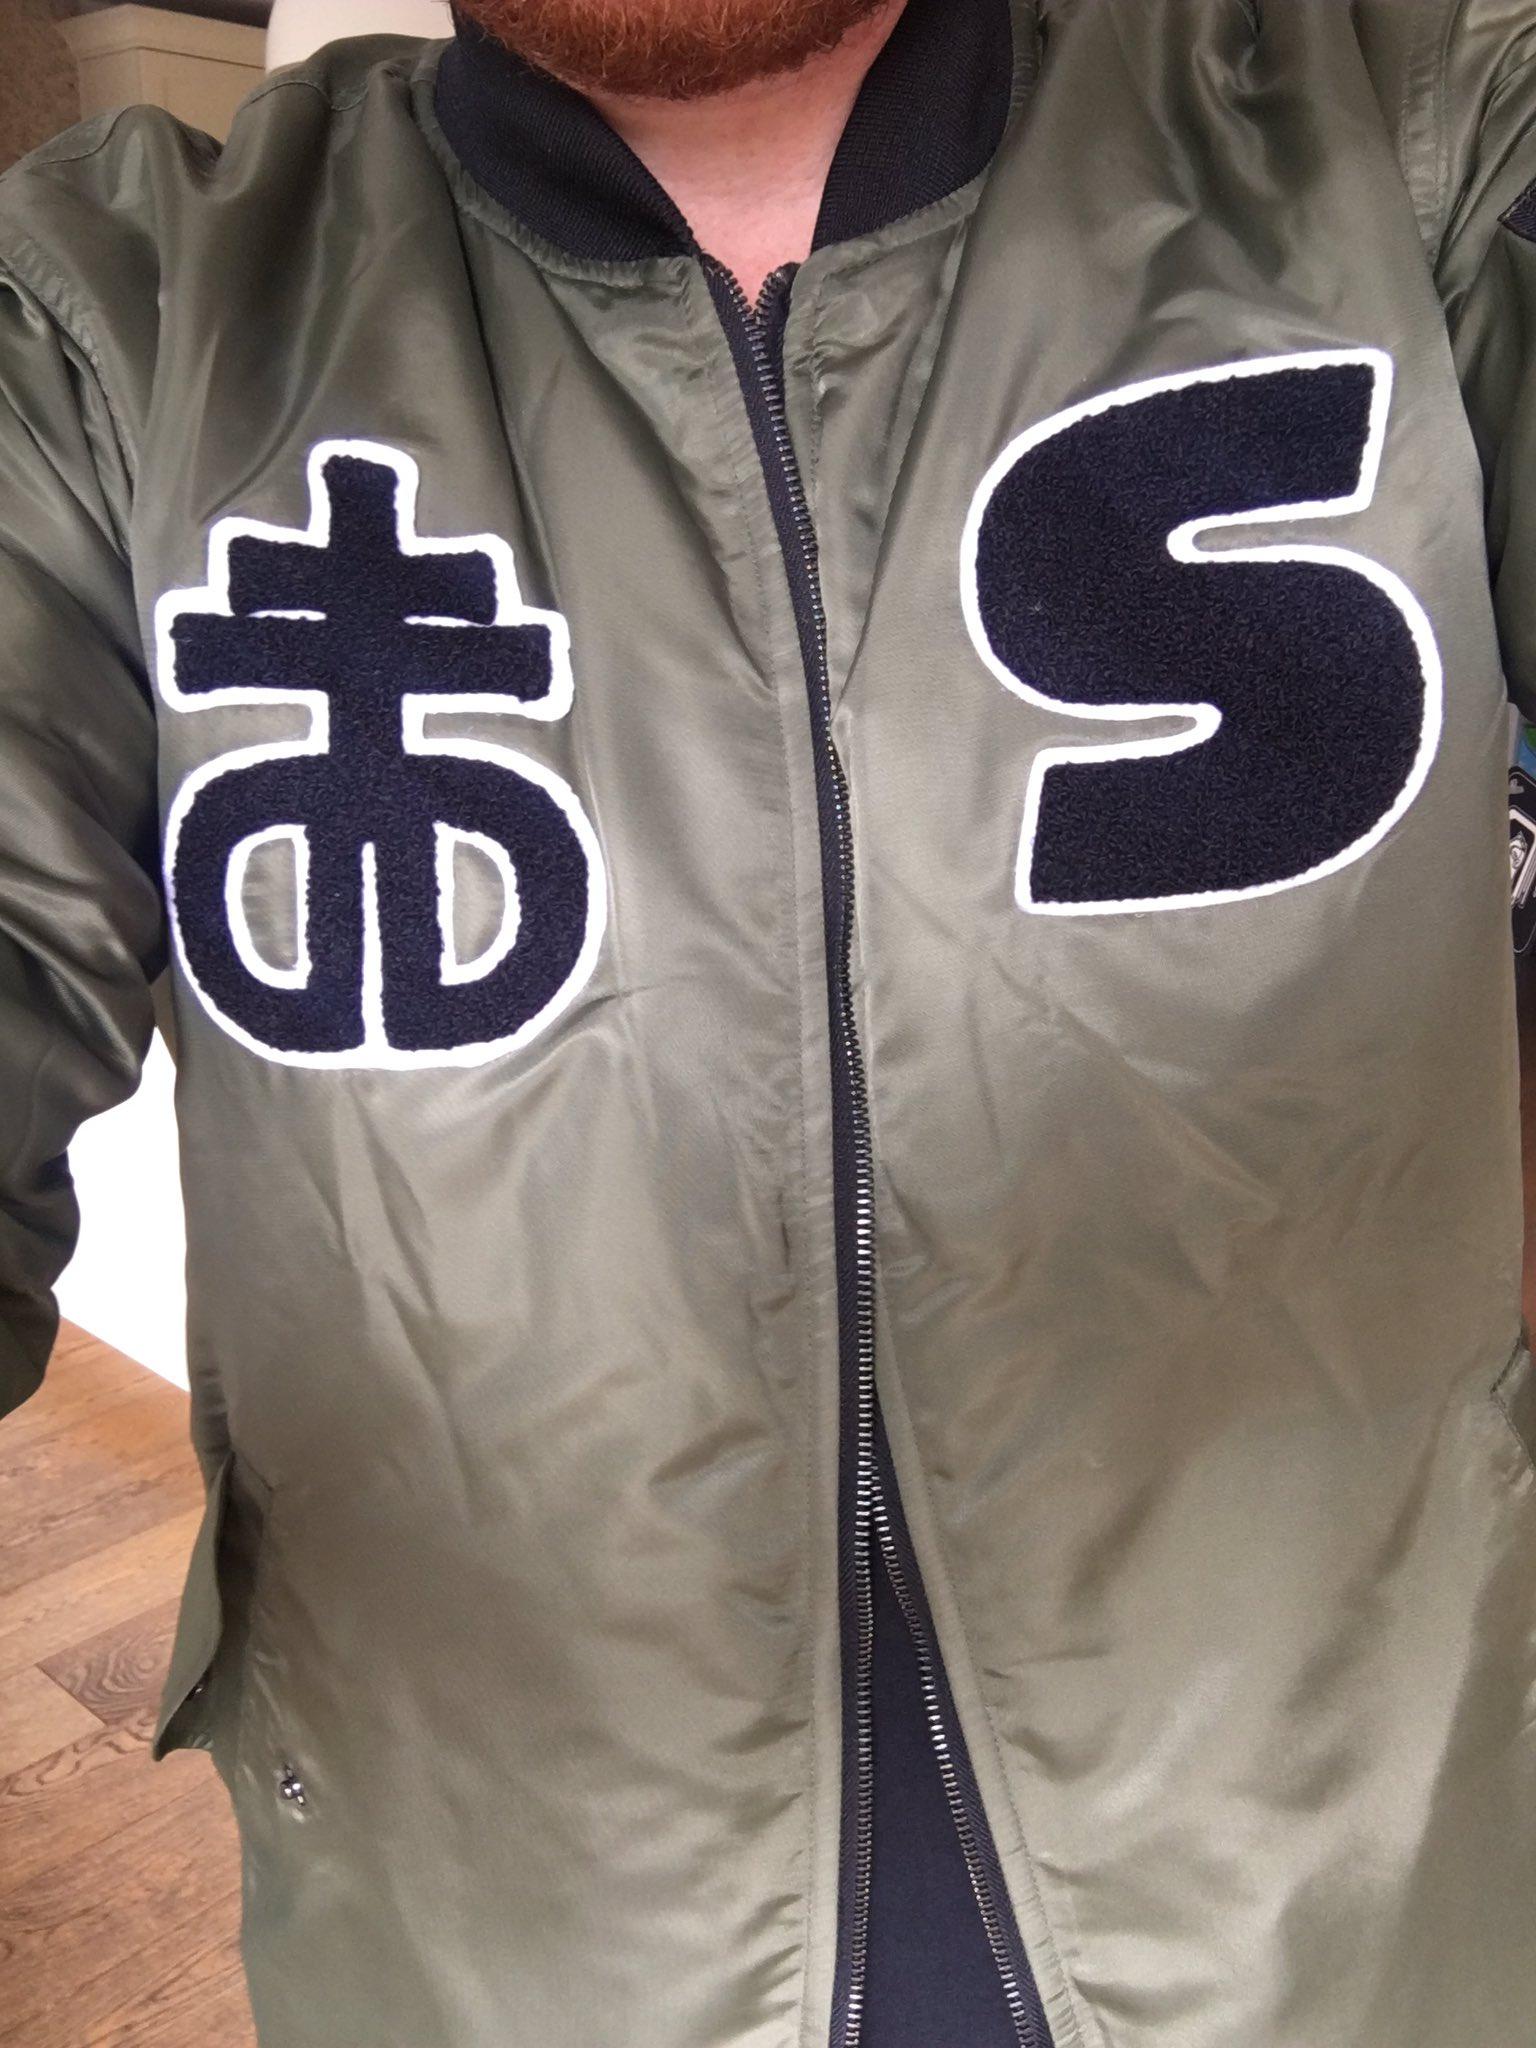 Jacket skills by @Dropdeaduk ace! https://t.co/DZAu2YaIxE